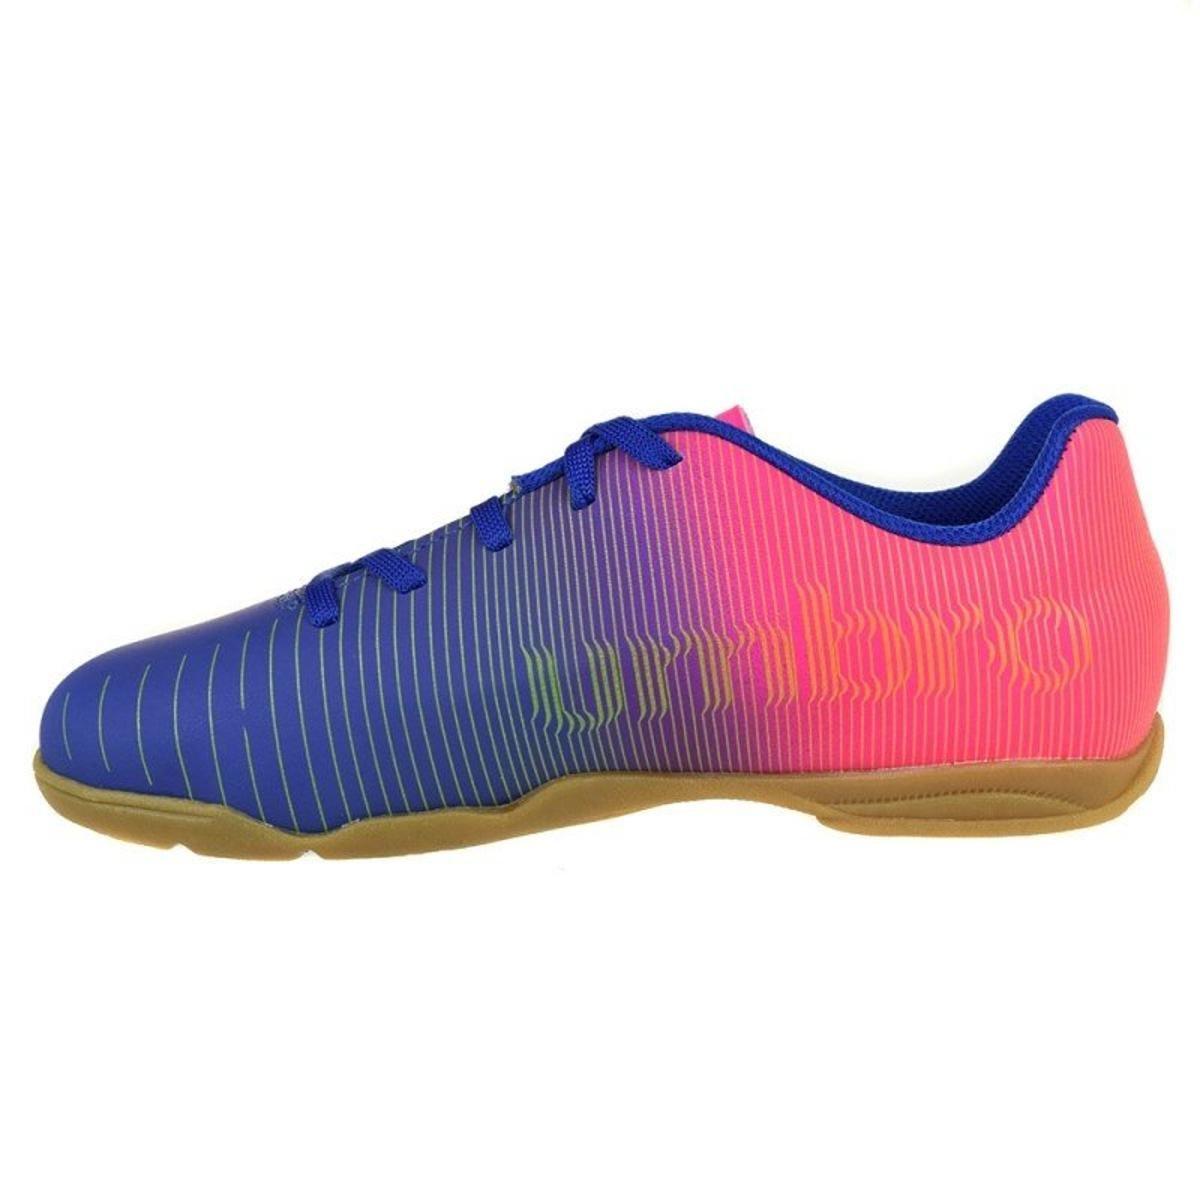 Chuteira Futsal Infantil Indoor Vibe Umbro - Compre Agora  d4dd6d0efd21f